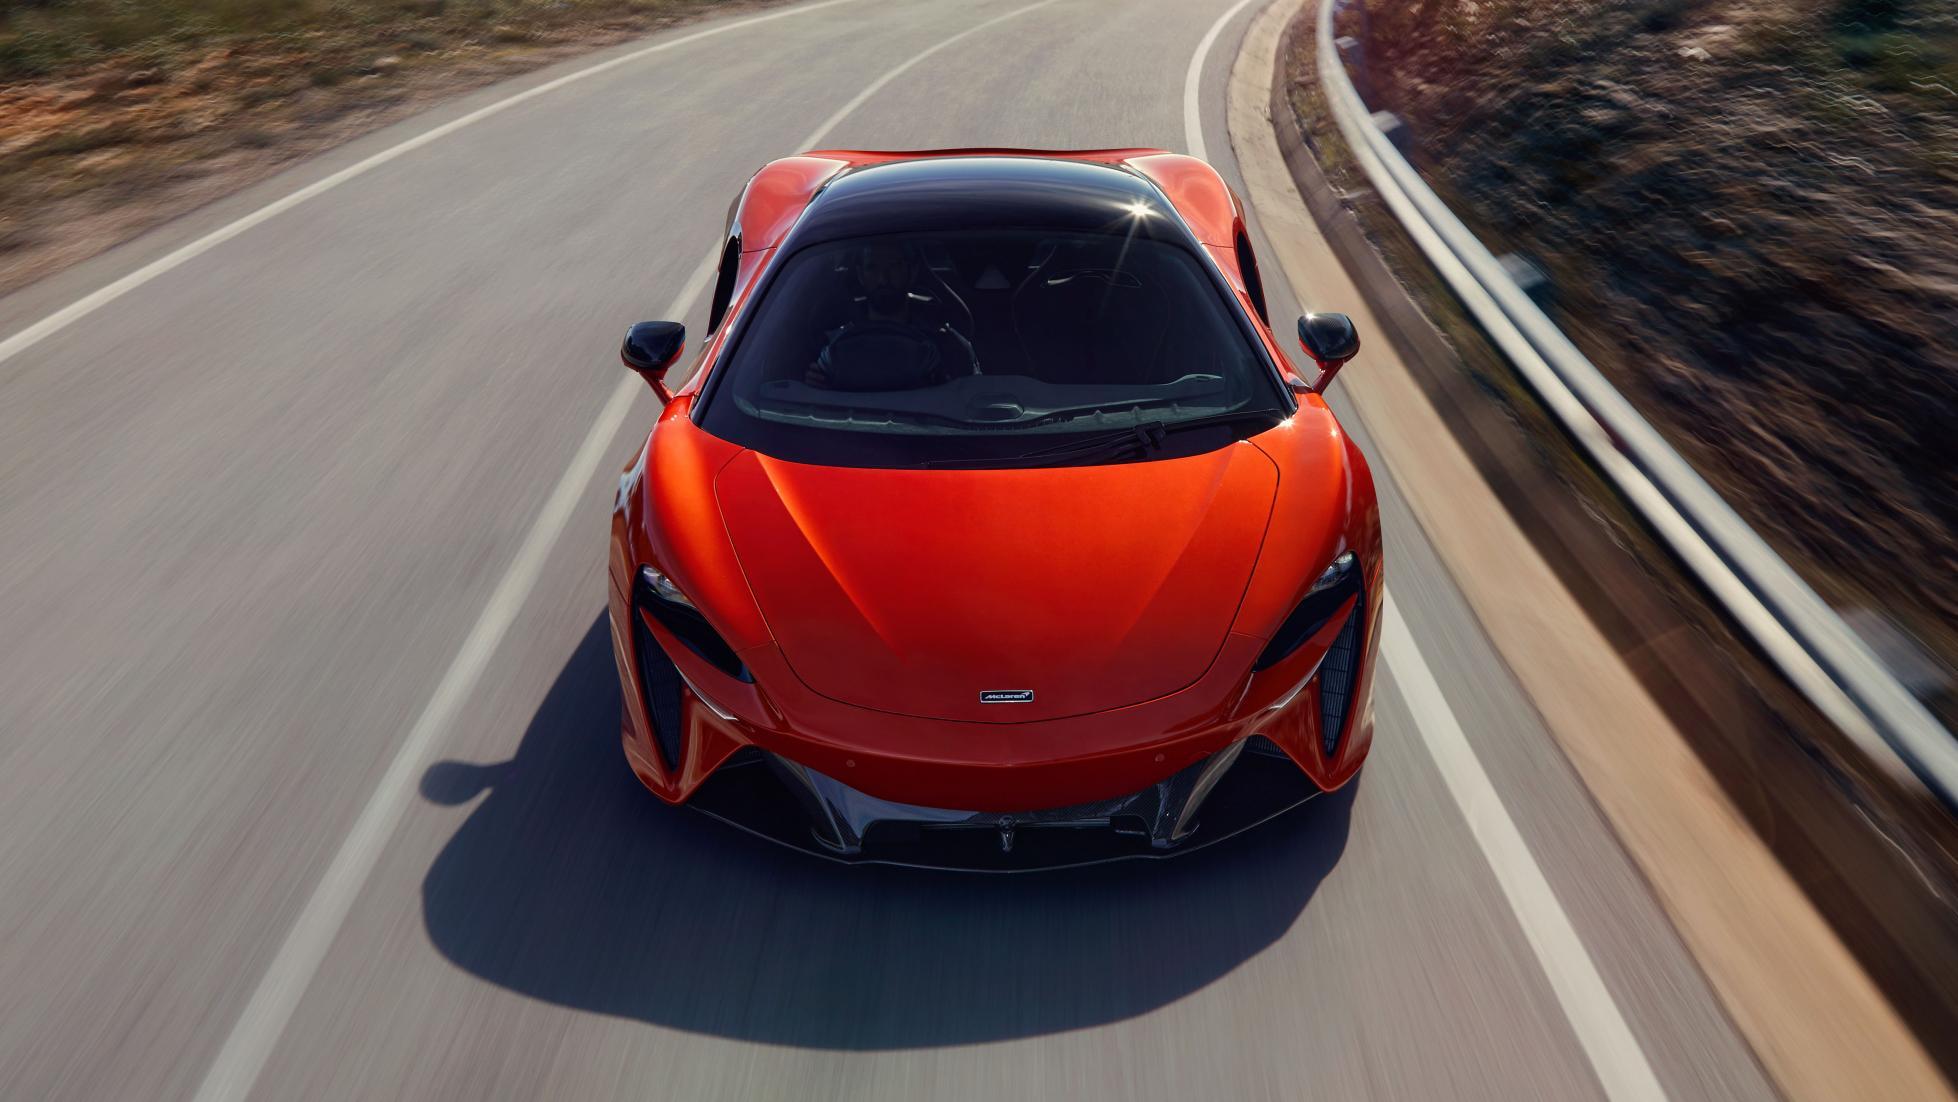 McLaren Artura front view top angle